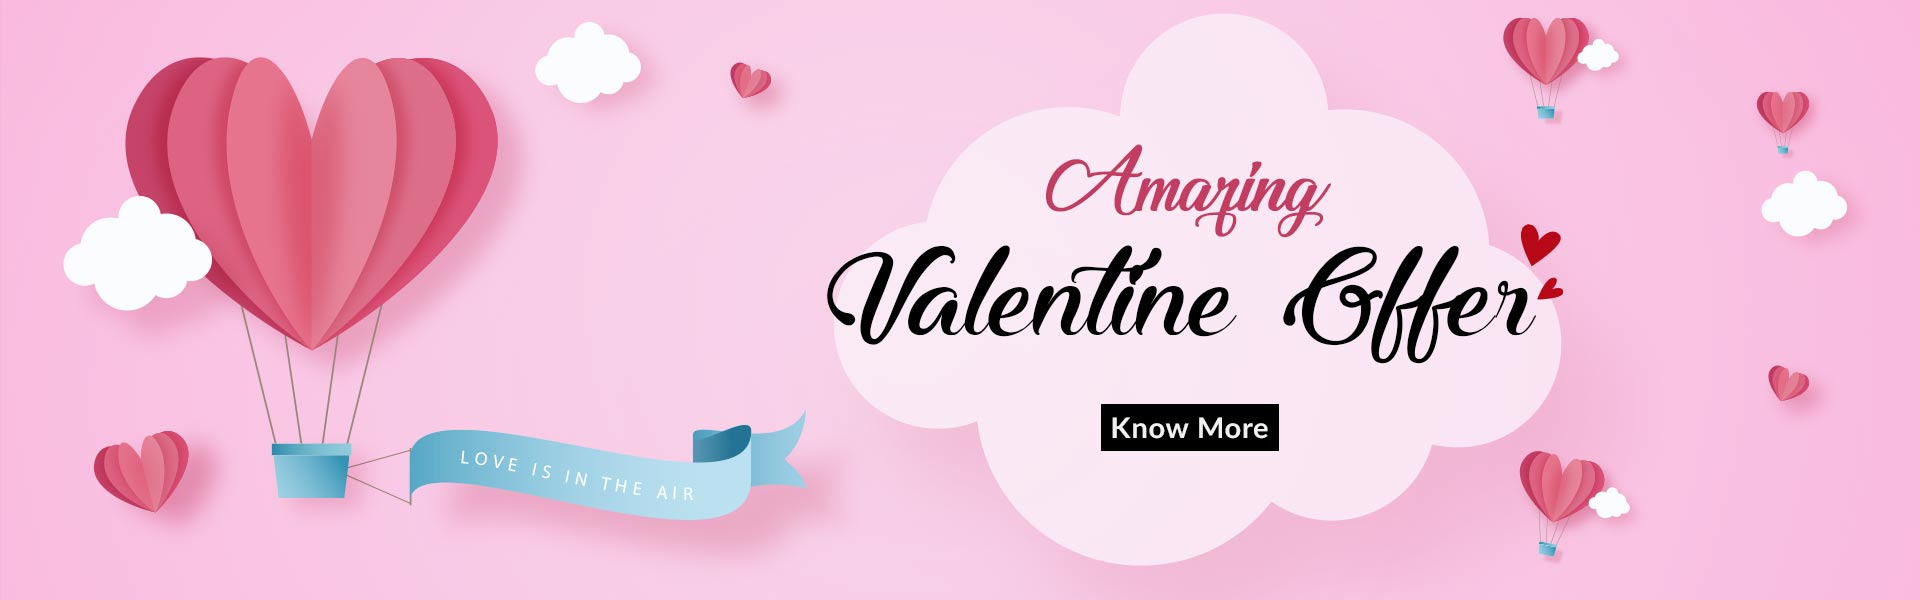 Valentine Offer 2018